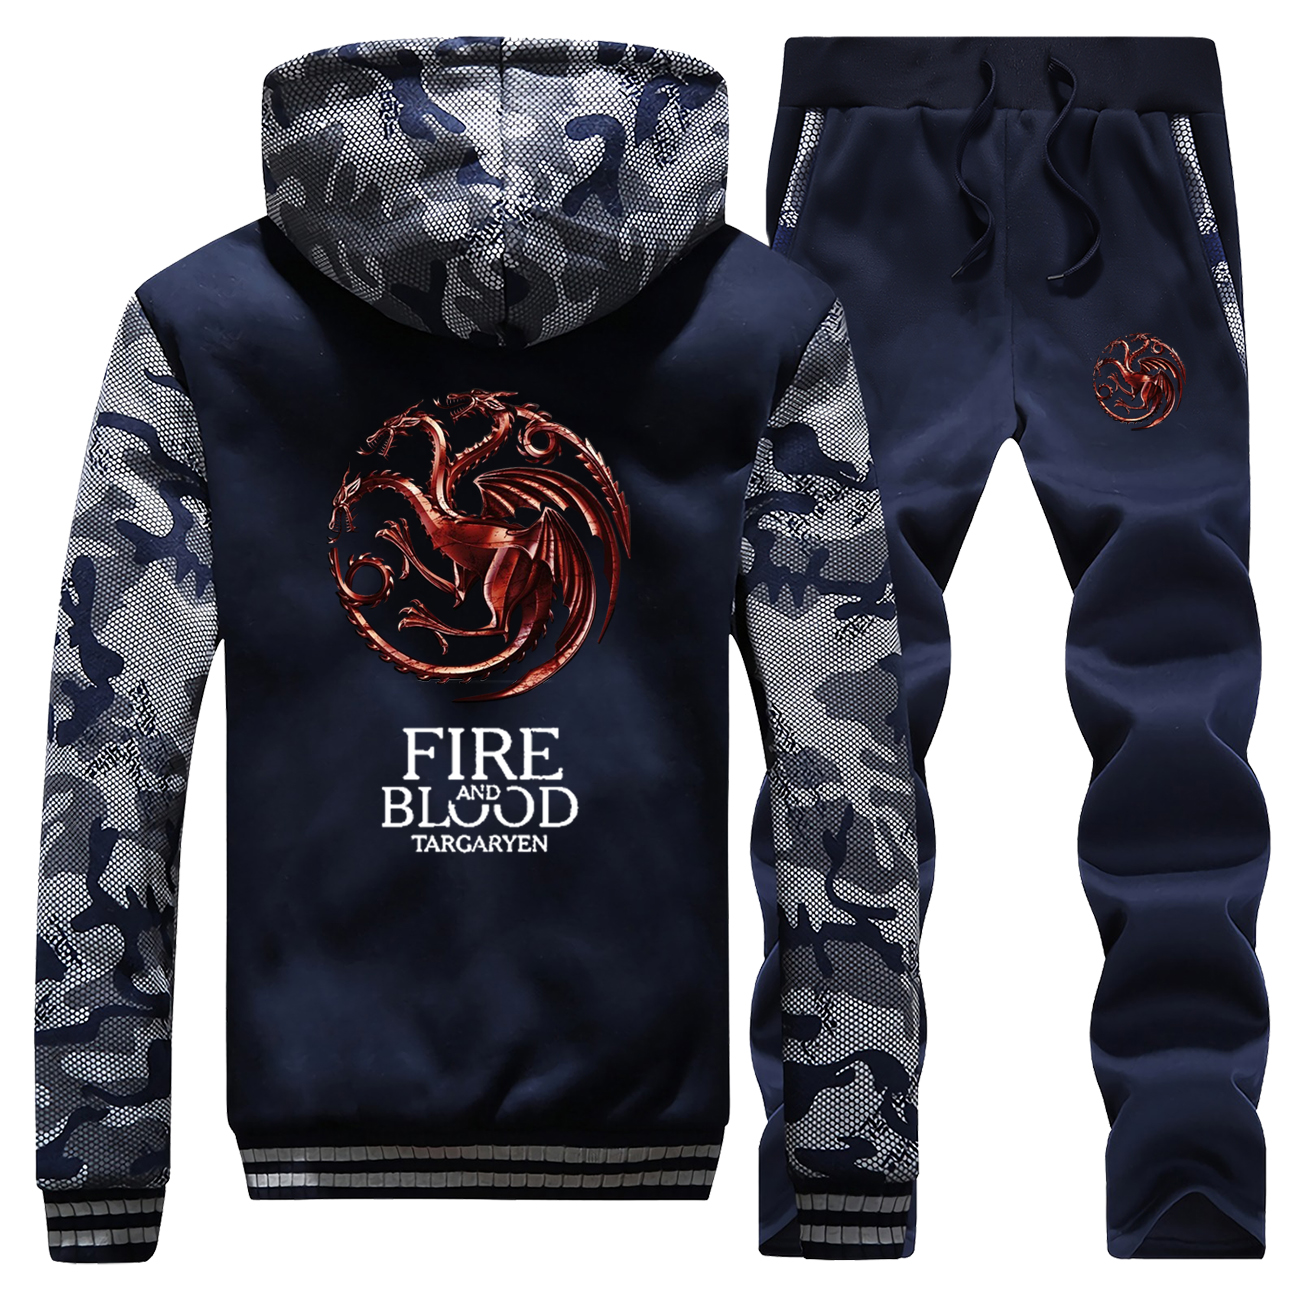 Fire And Blood Camo Male Set Thick Hoodie Fleece Game Of Thrones Pants Sweatshirts Targayen Dragon Fleece Hip Hop Warm Tracksuit